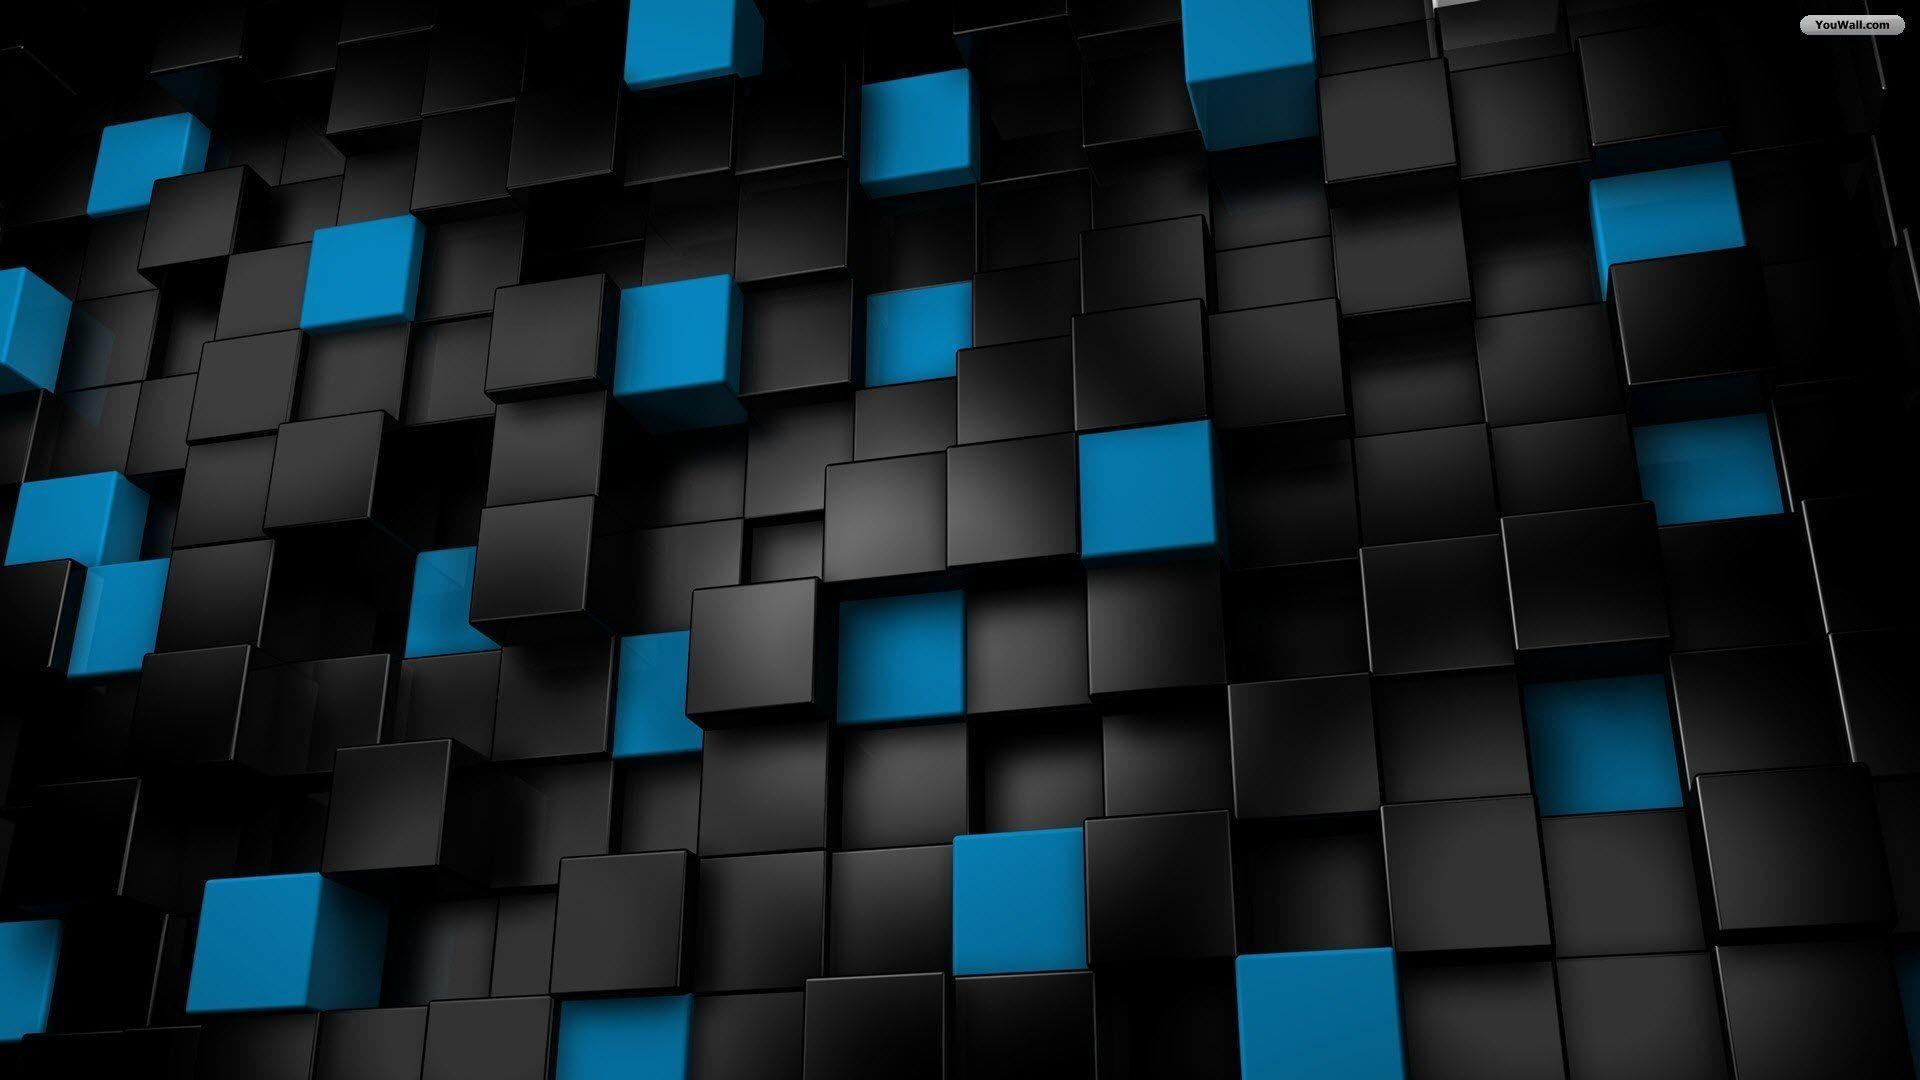 … Blue Hd Wallpaper. Download